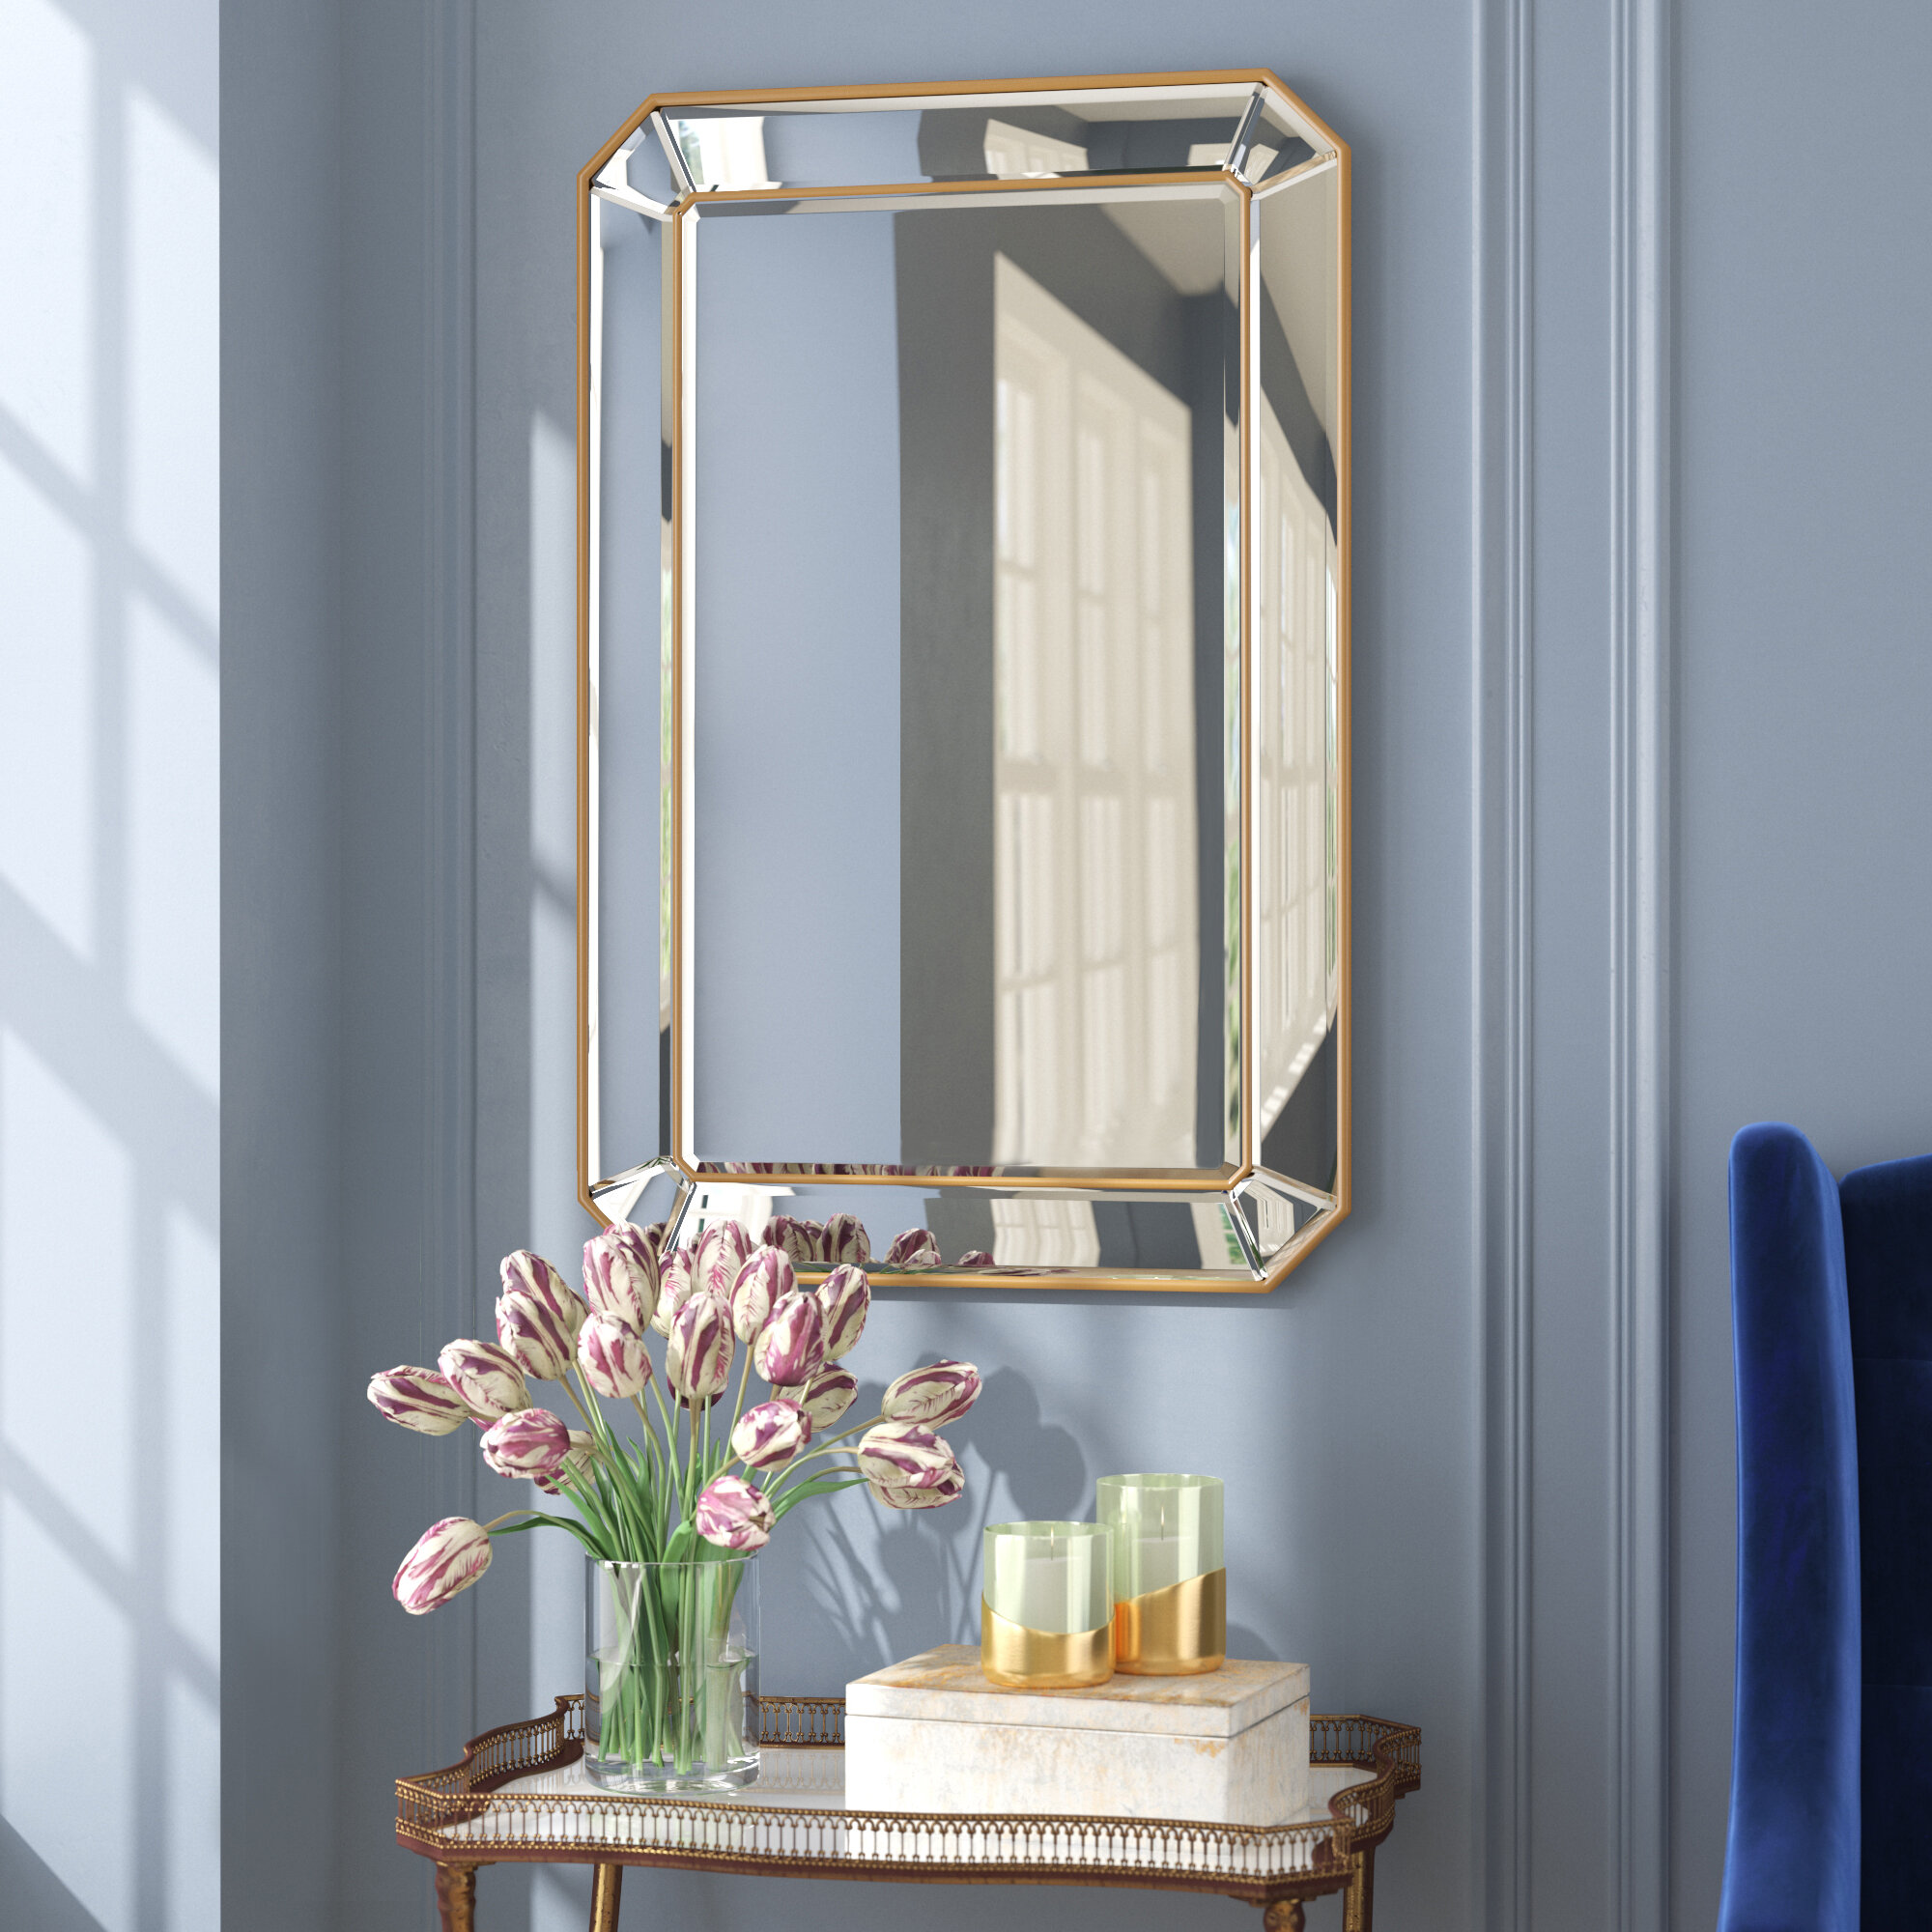 Willa Arlo Interiors Briley Rectangle Gold Angled Accent Wall Mirror